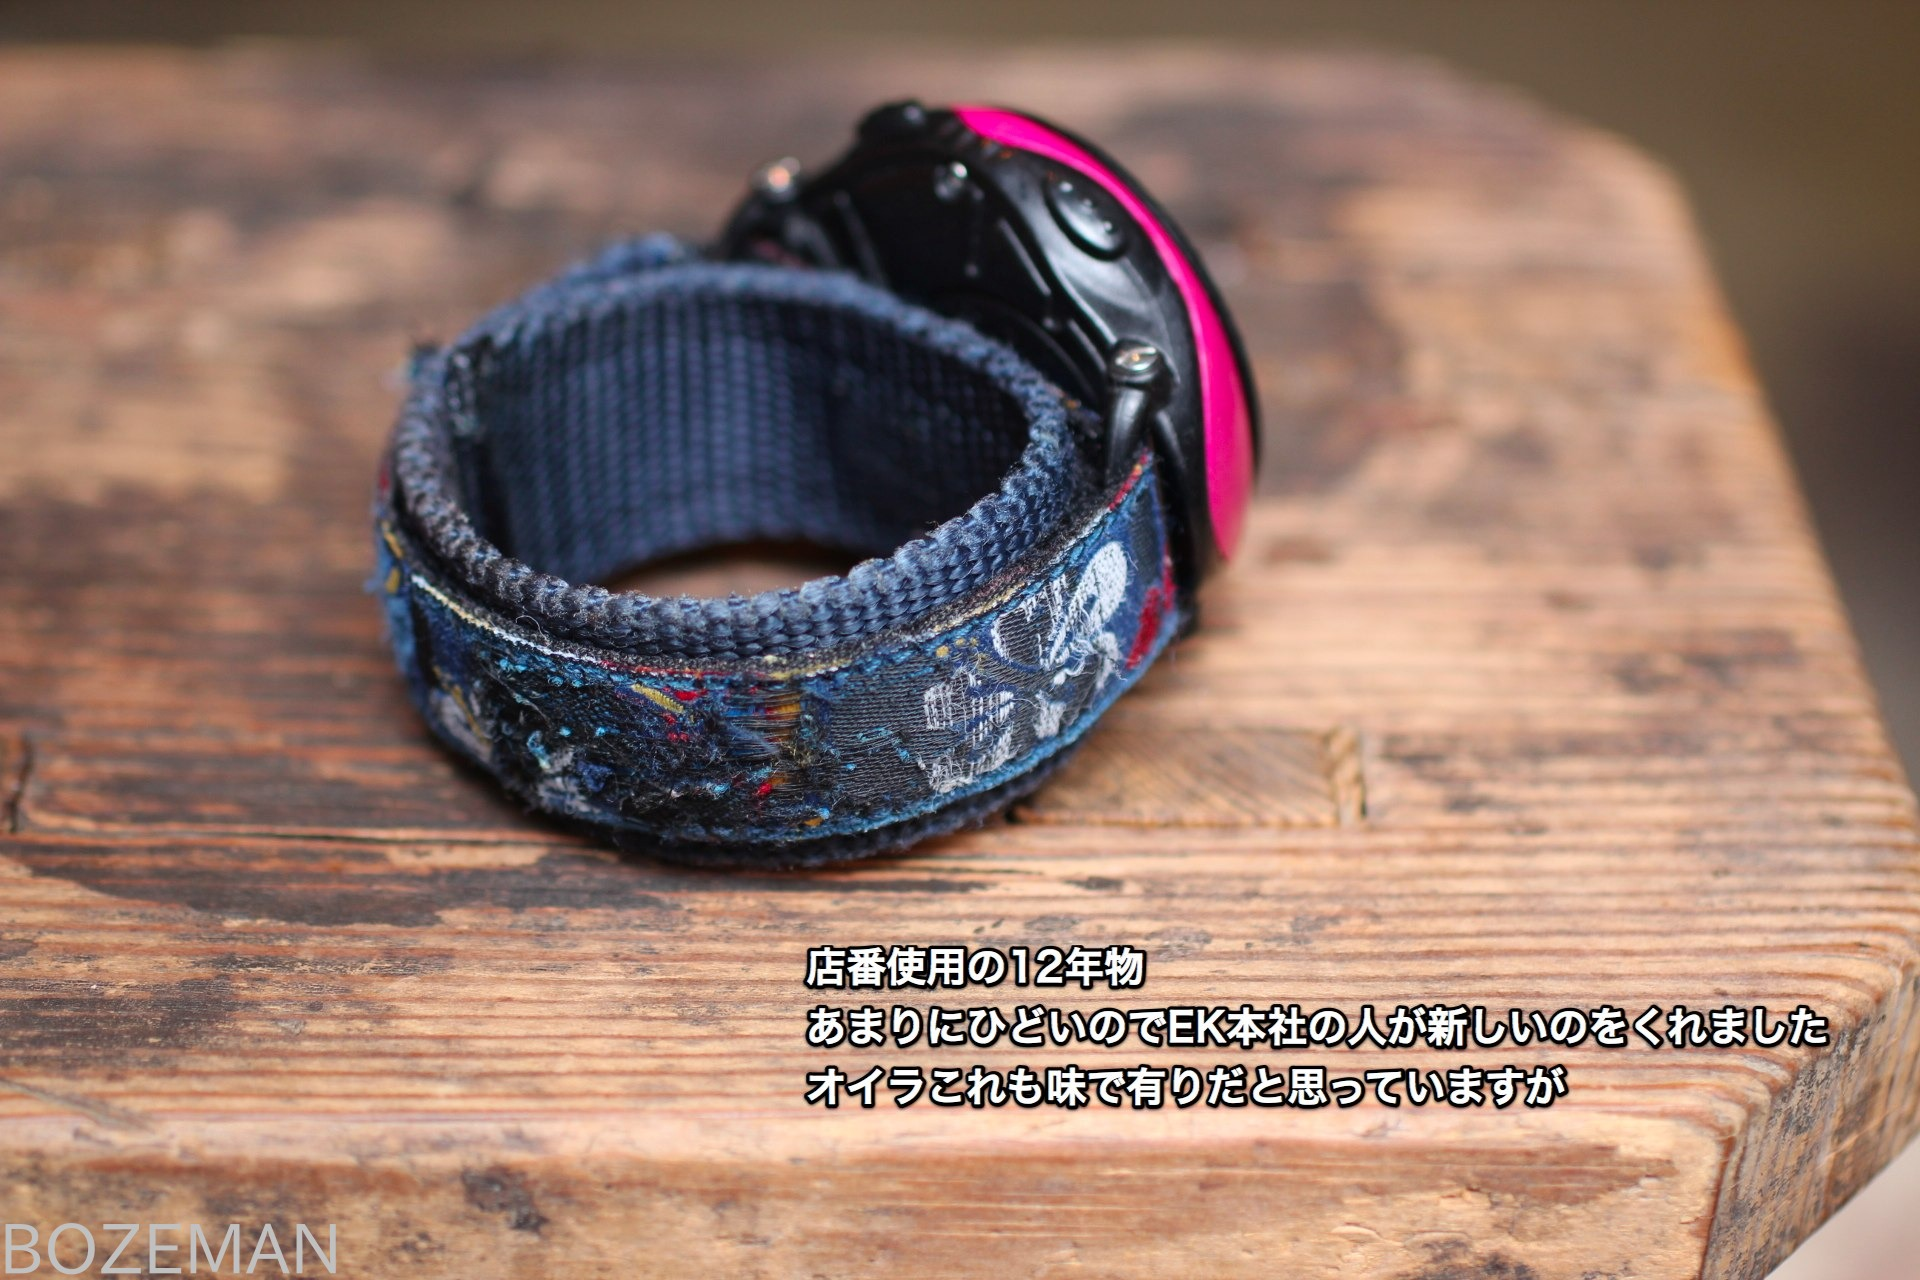 EK USA Designer Watch Band_f0159943_1304443.jpg